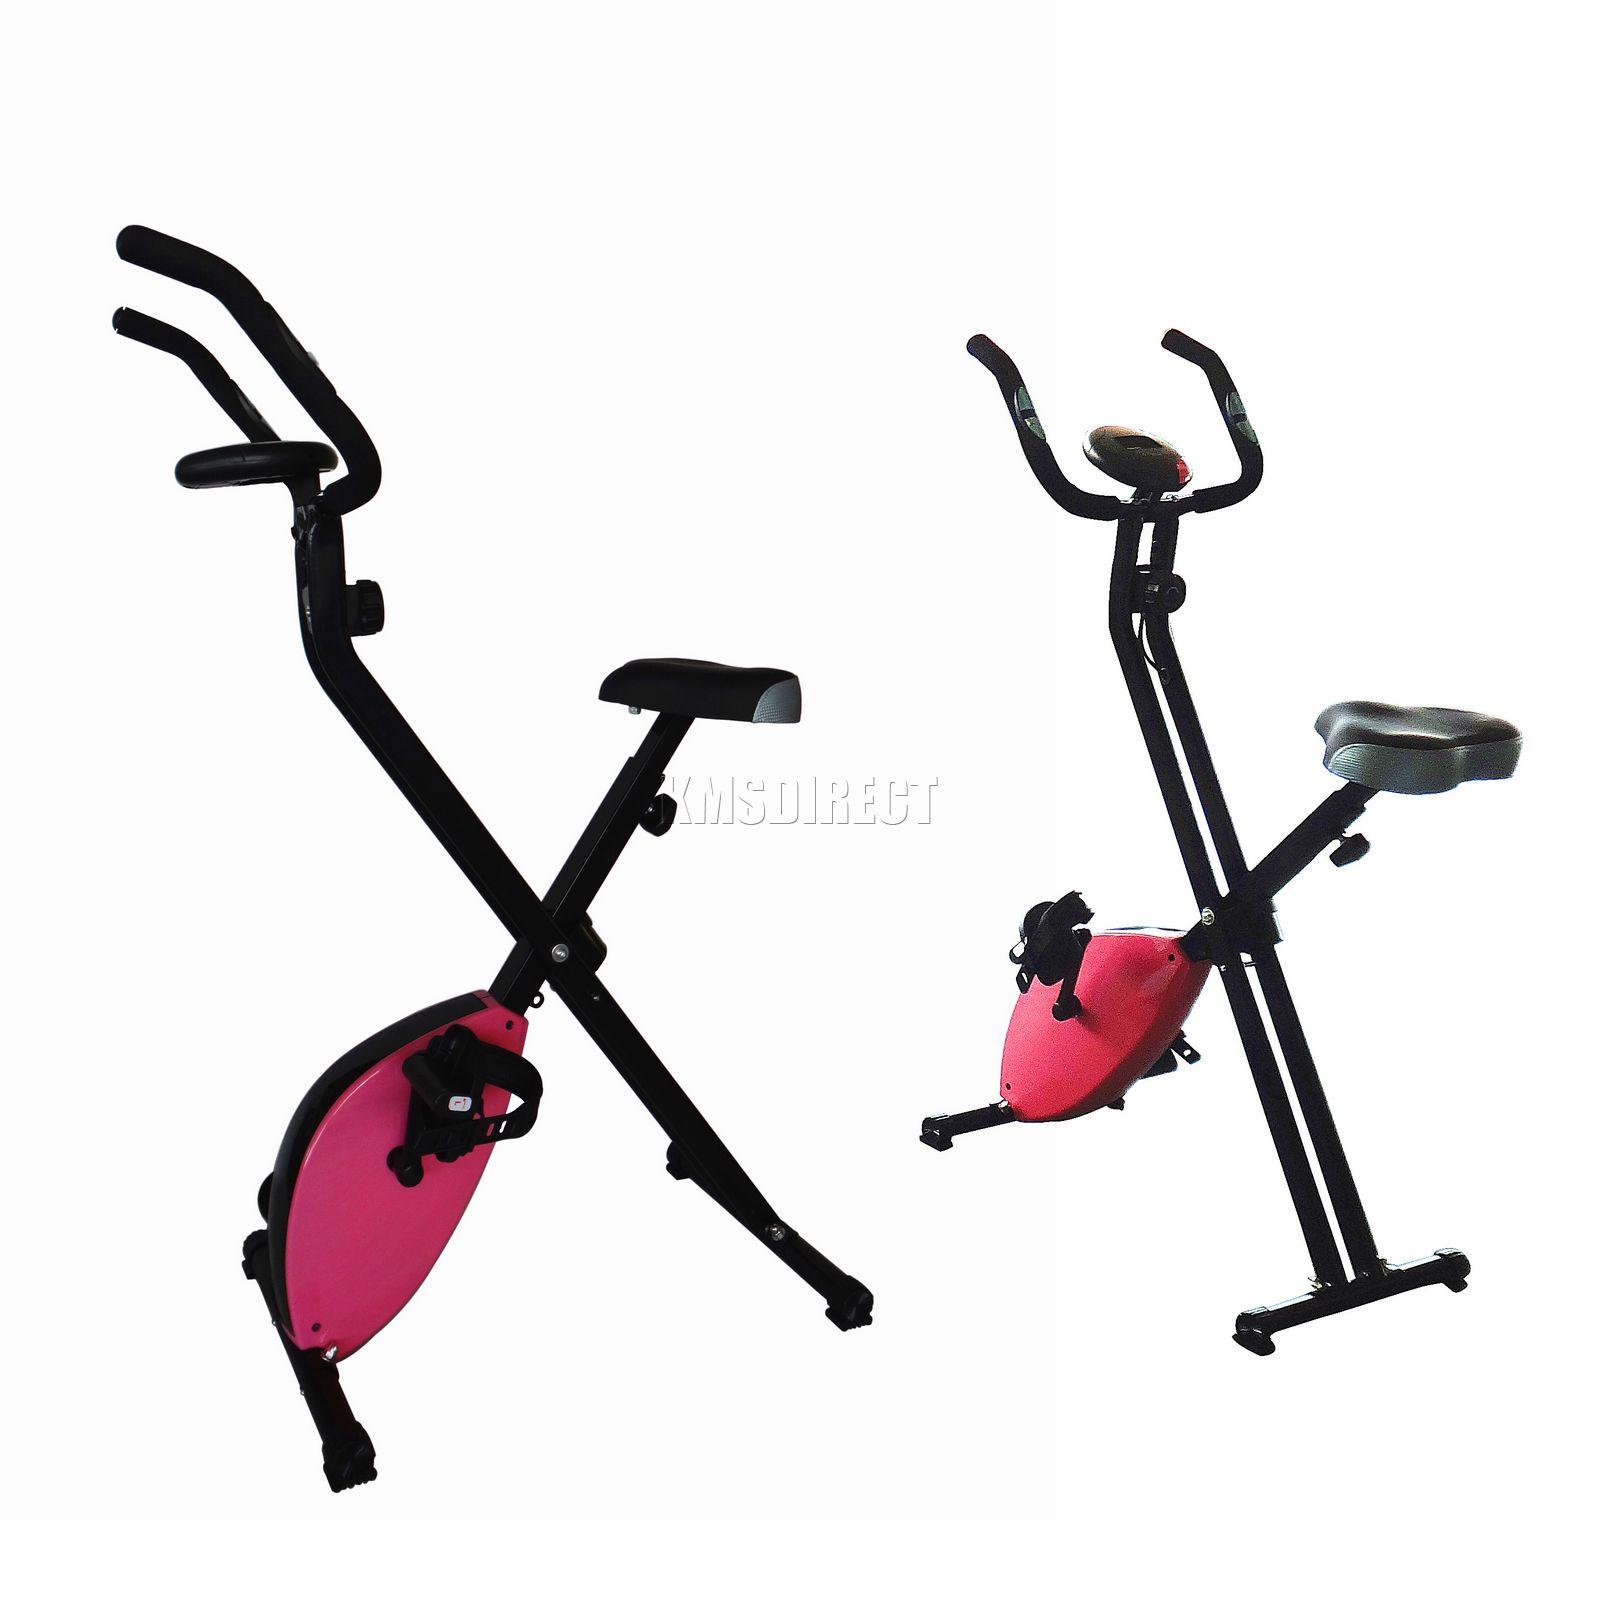 V lo pliant perte magn tique x bike fitness workout io poids rose - Velo semi allonge perte de poids ...